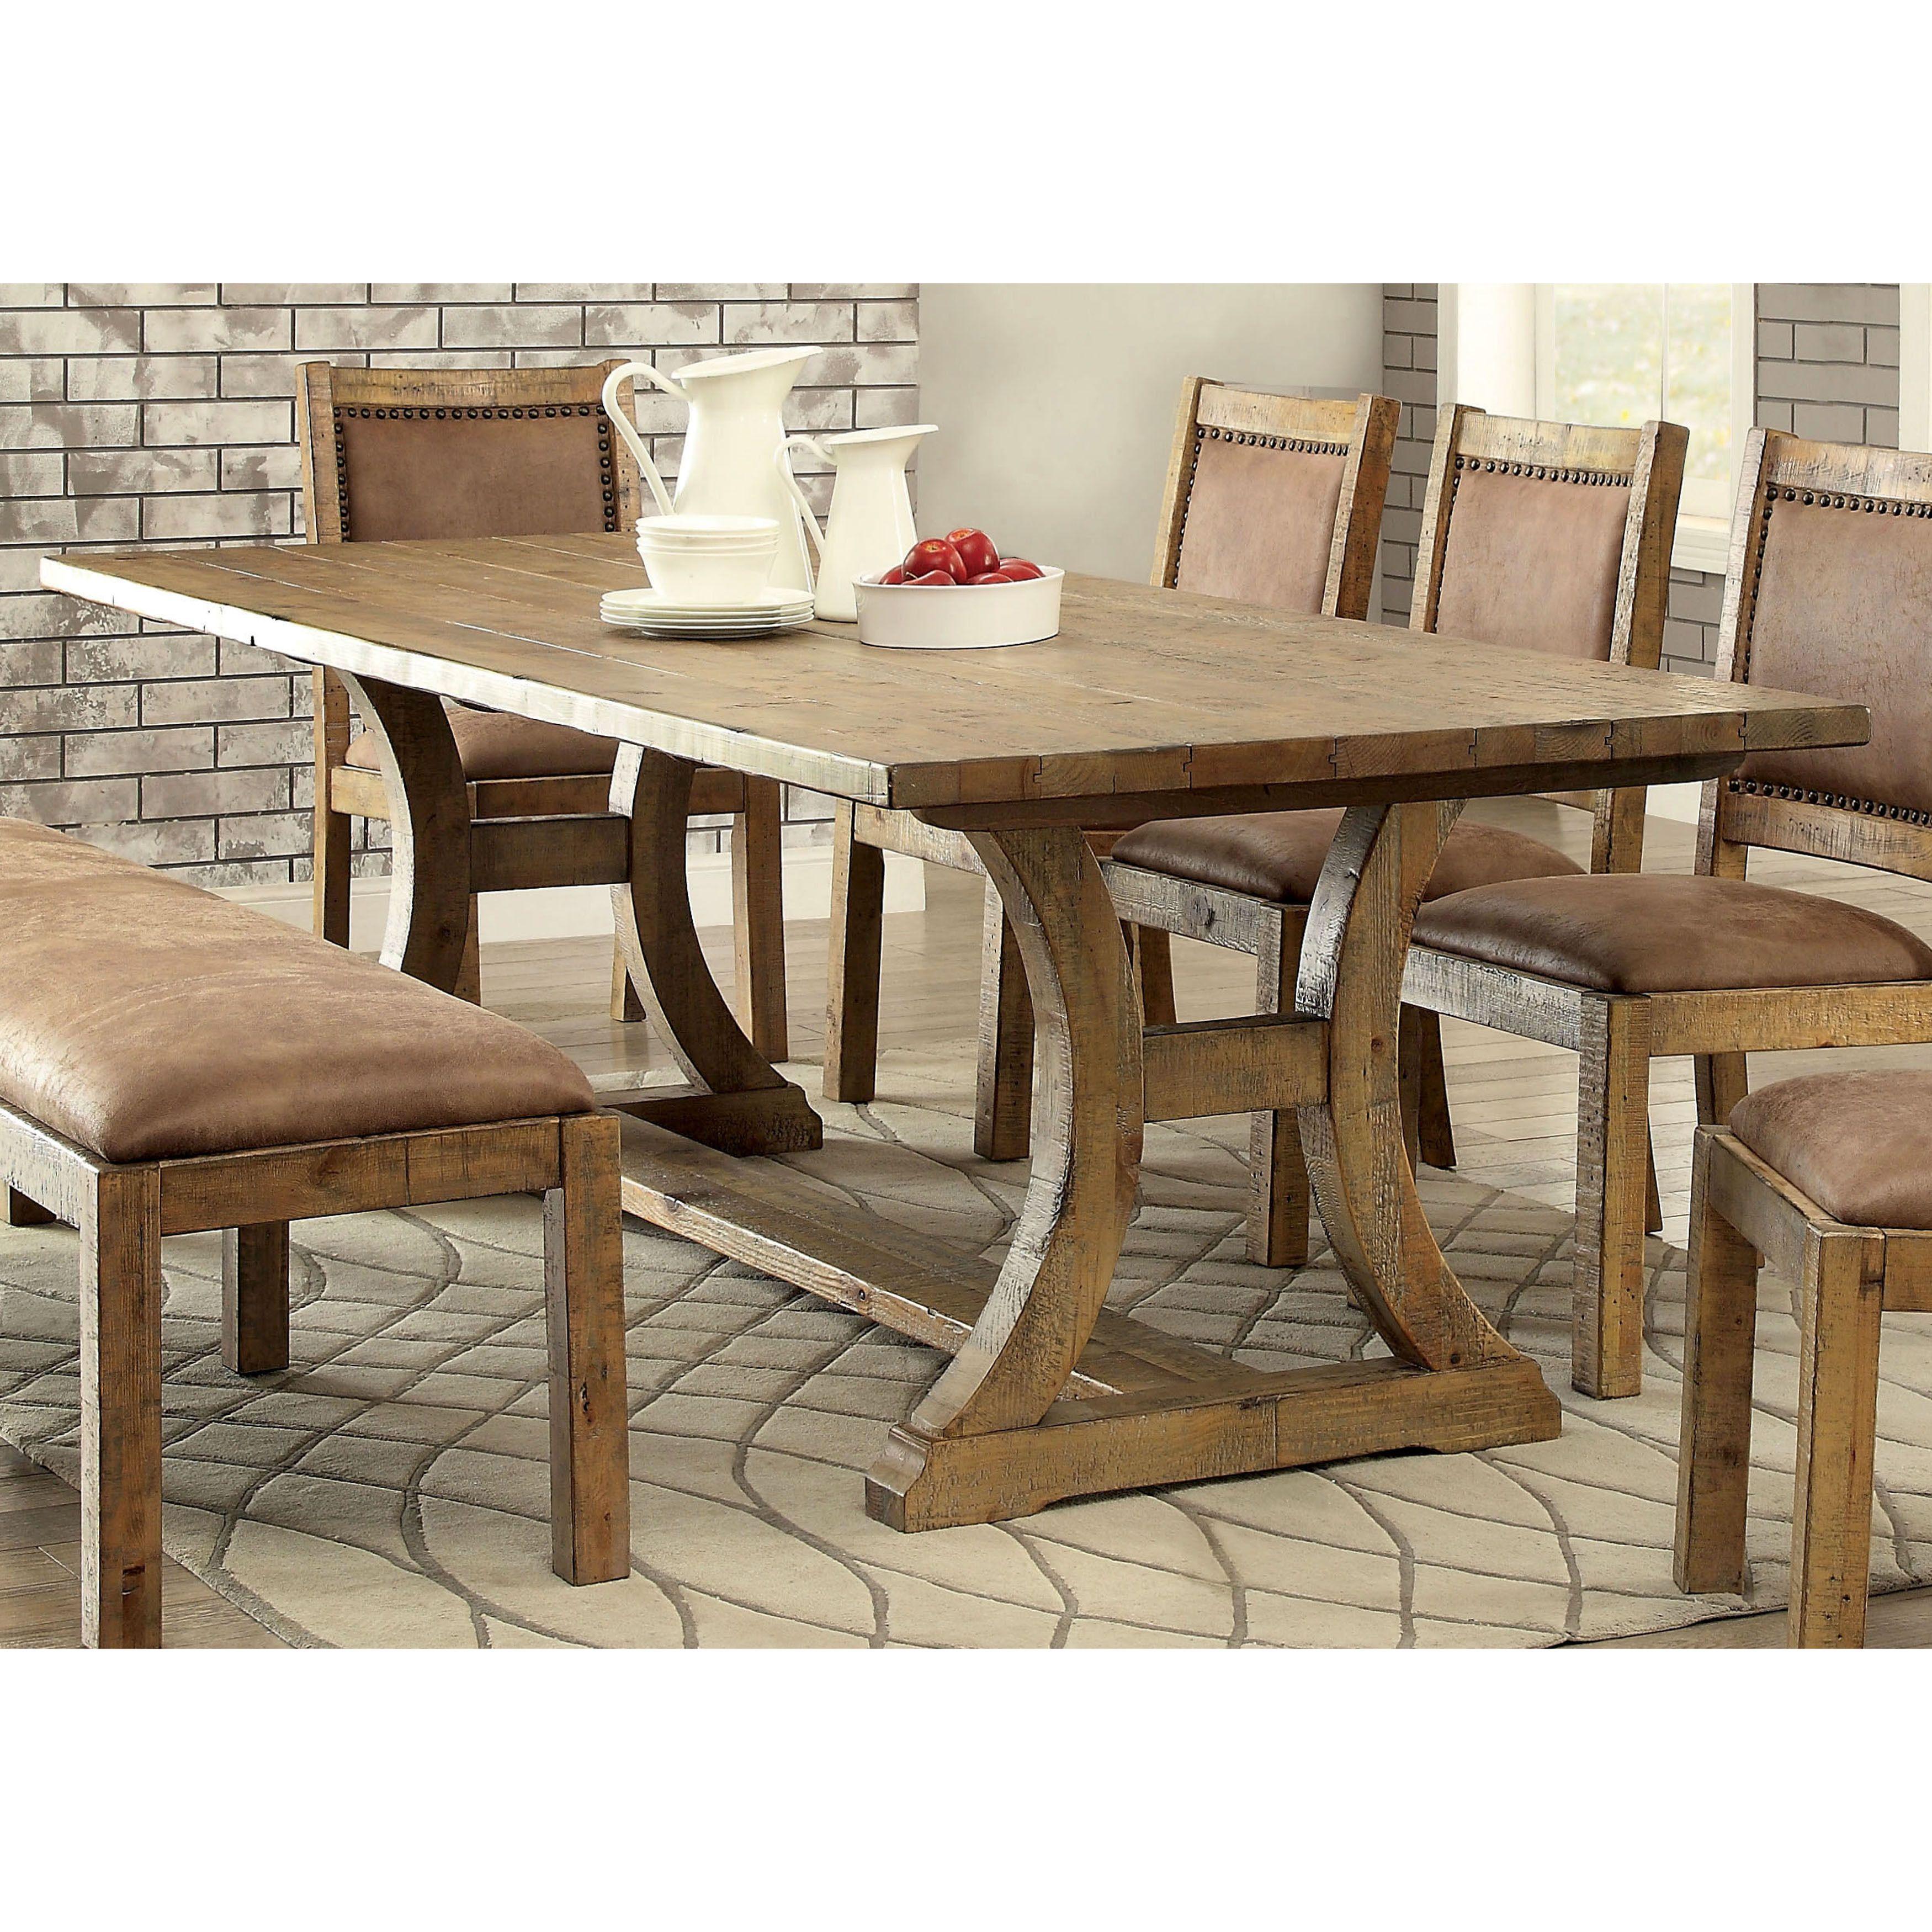 Furniture Of America Matthias Rustic Pine Dining Table 96 Inch Brown